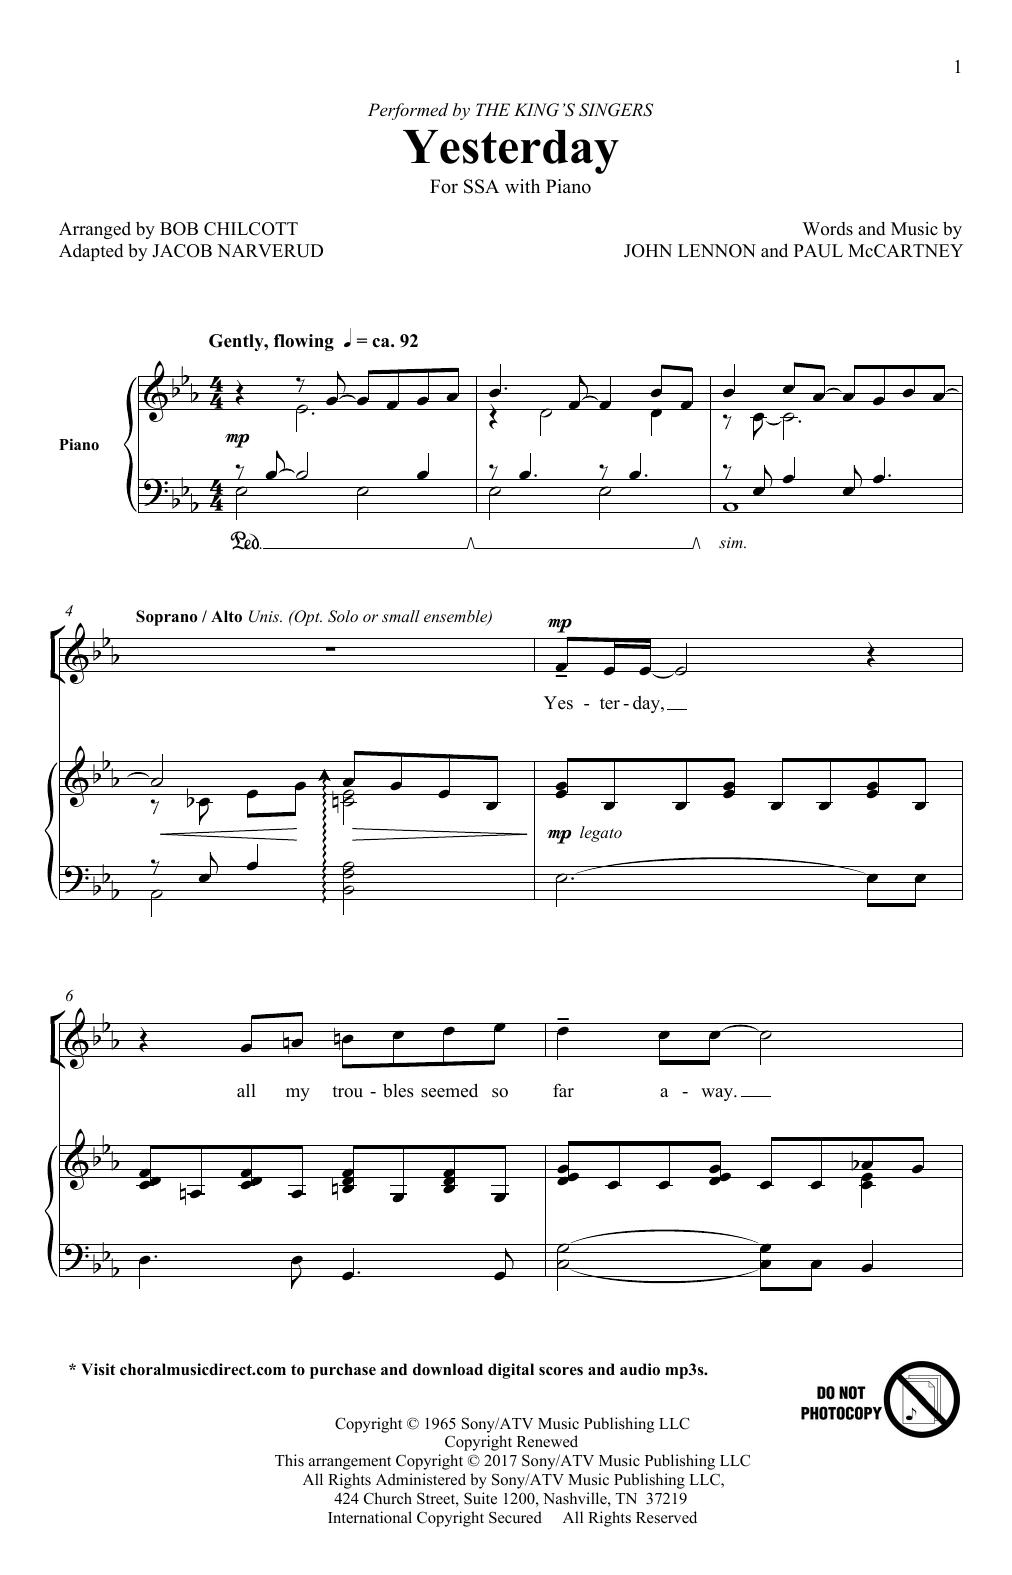 Yesterday (adapt. Jacob Narverud) Sheet Music